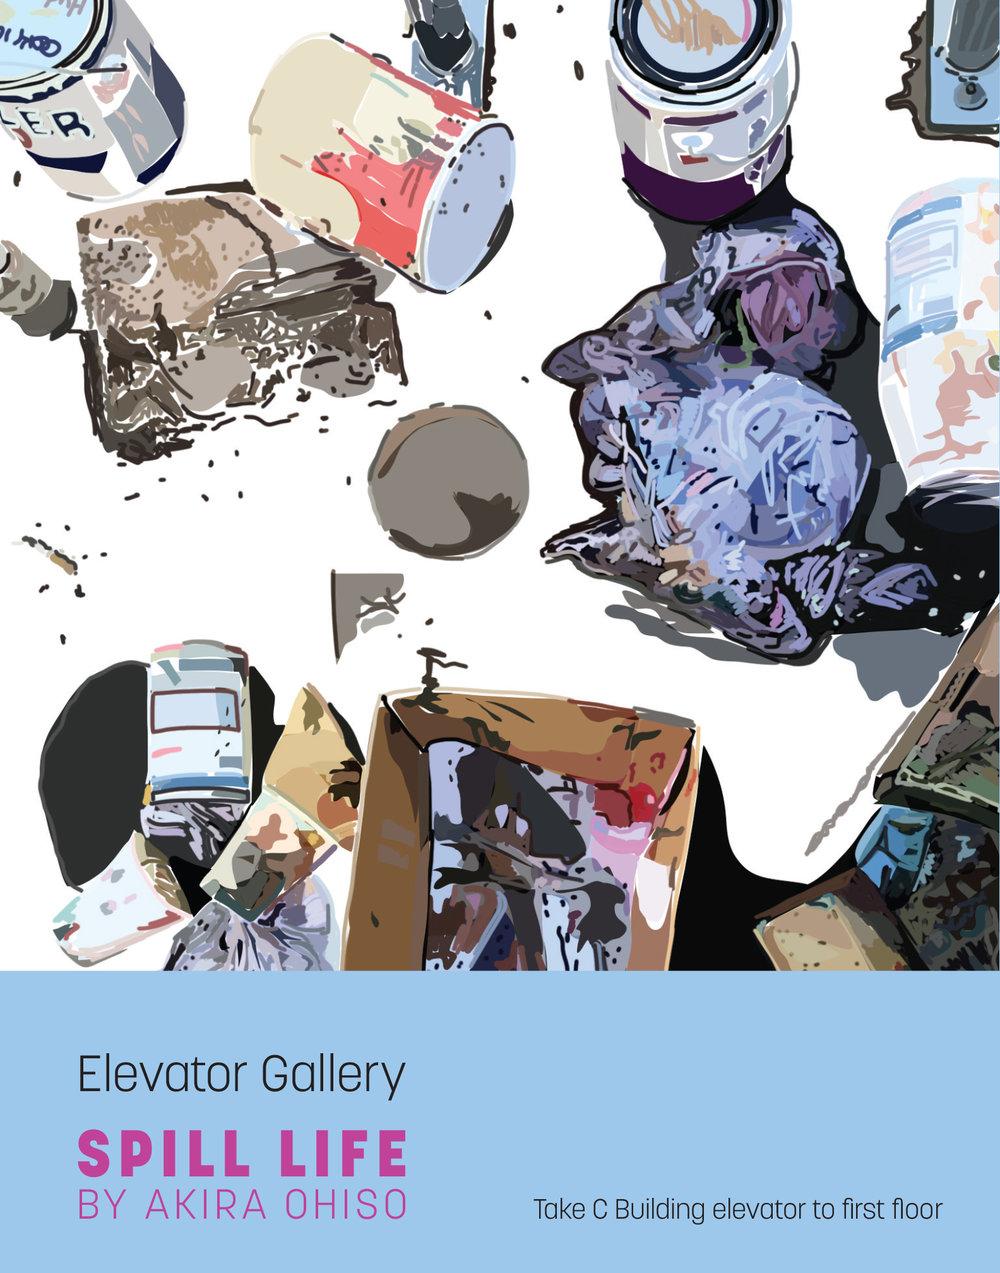 Poster22x28_Side2.jpg